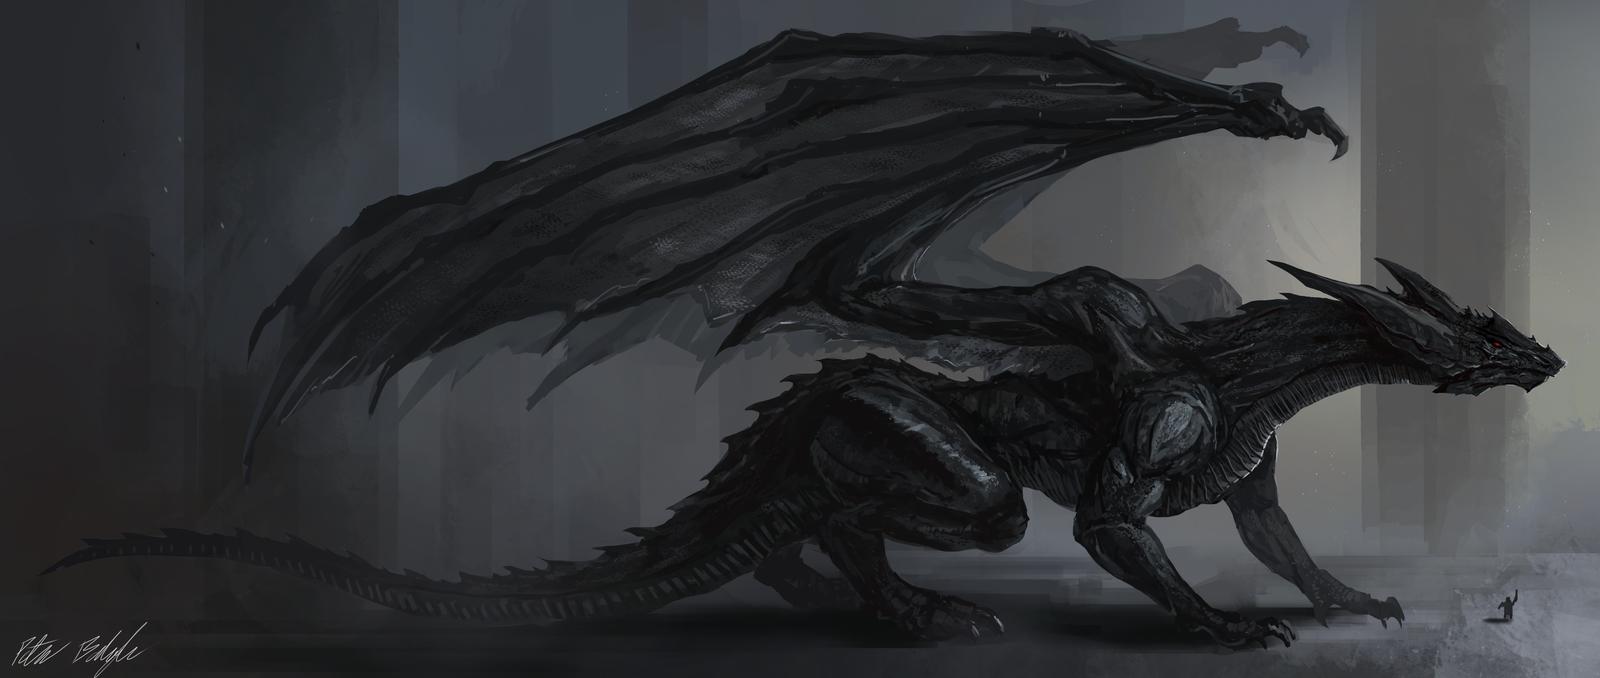 Ferrum's Character Application Black-Dragon-1